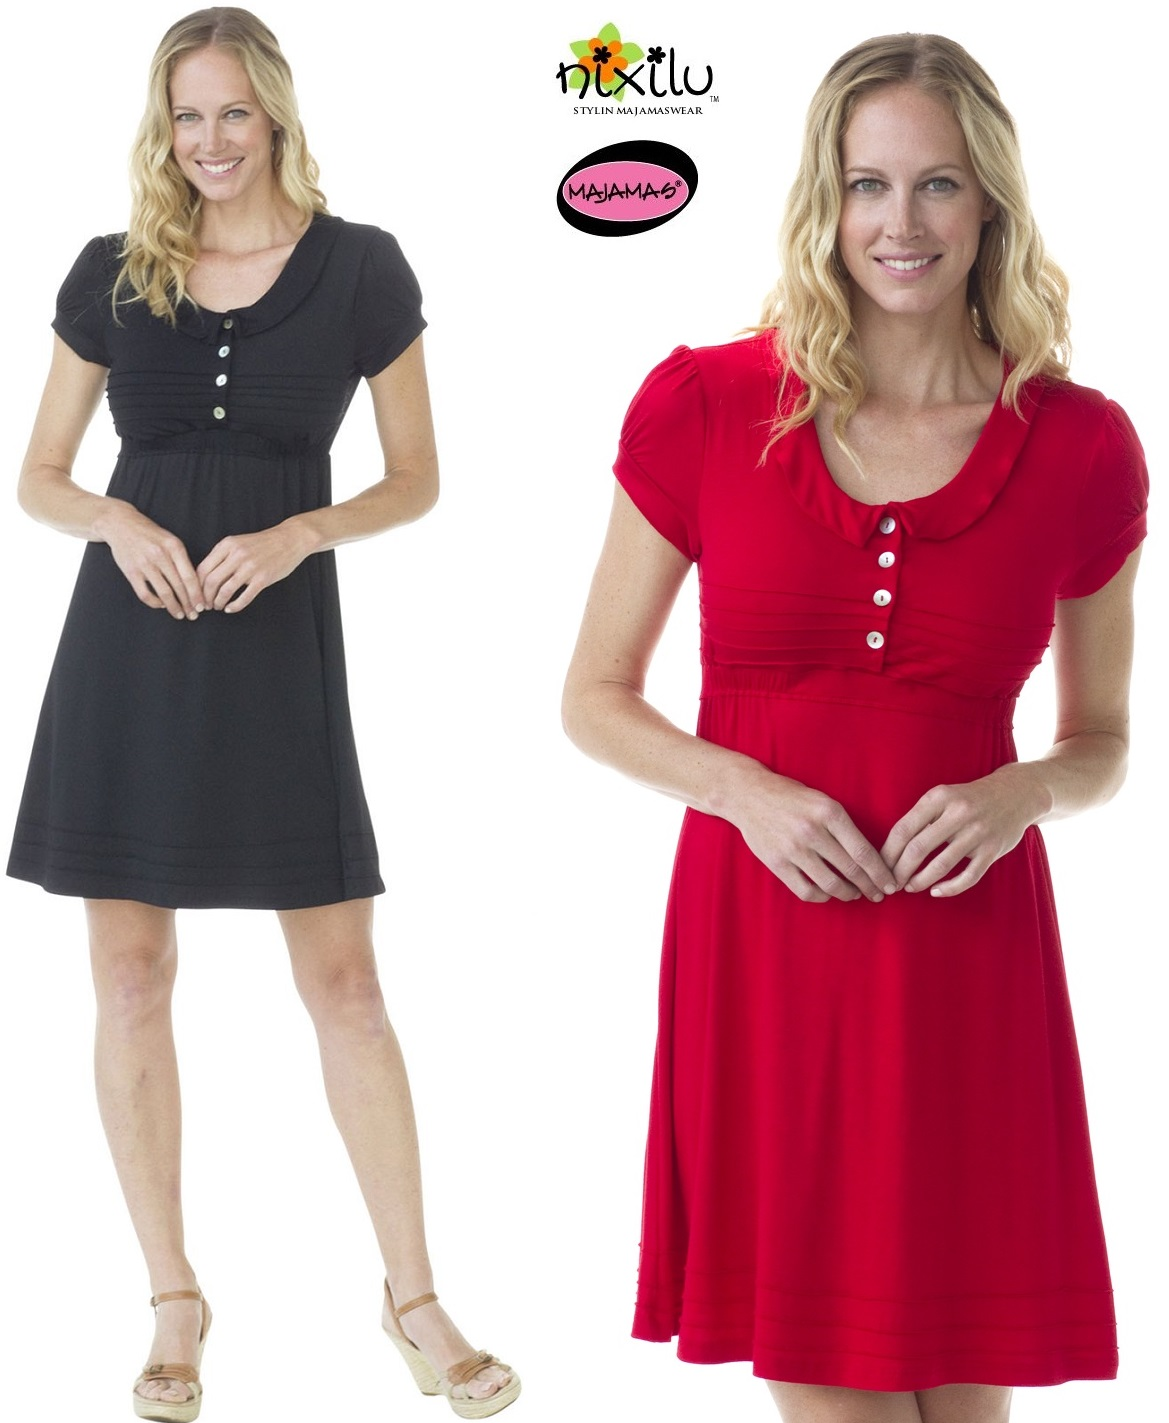 nixilu-coquette-nursing-dress-all-2.jpg